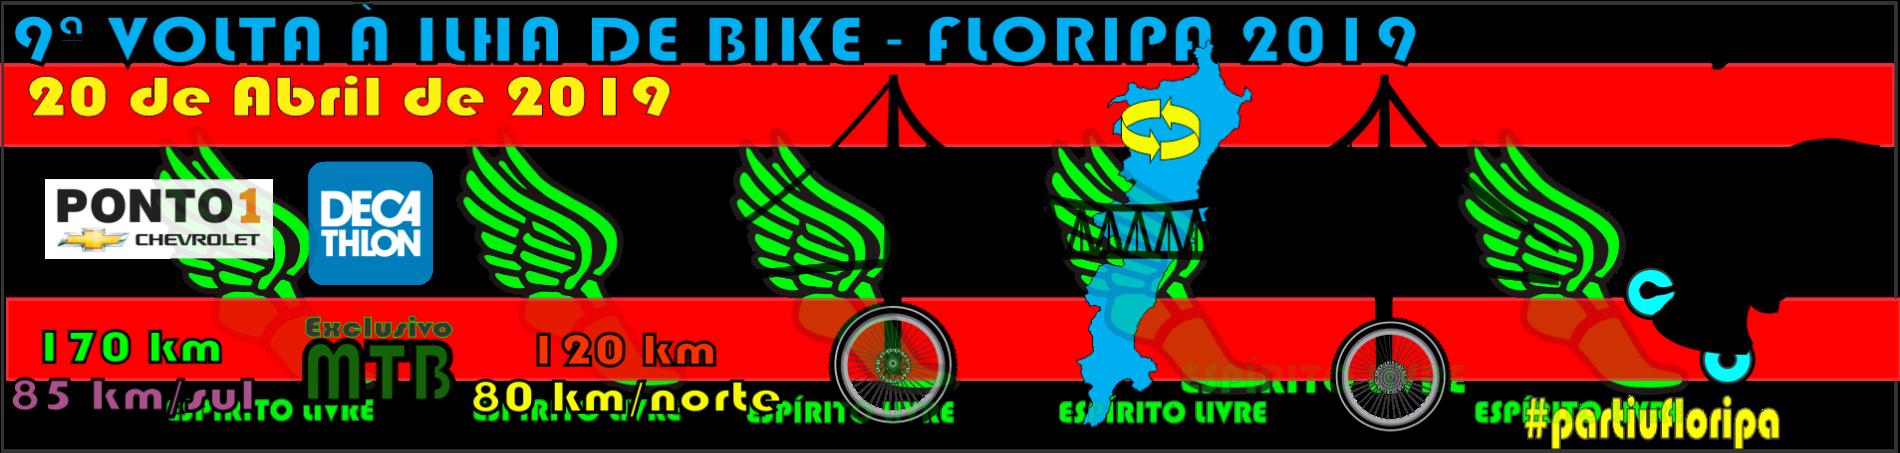 9ª VOLTA À ILHA DE BIKE - FLORIPA 2019